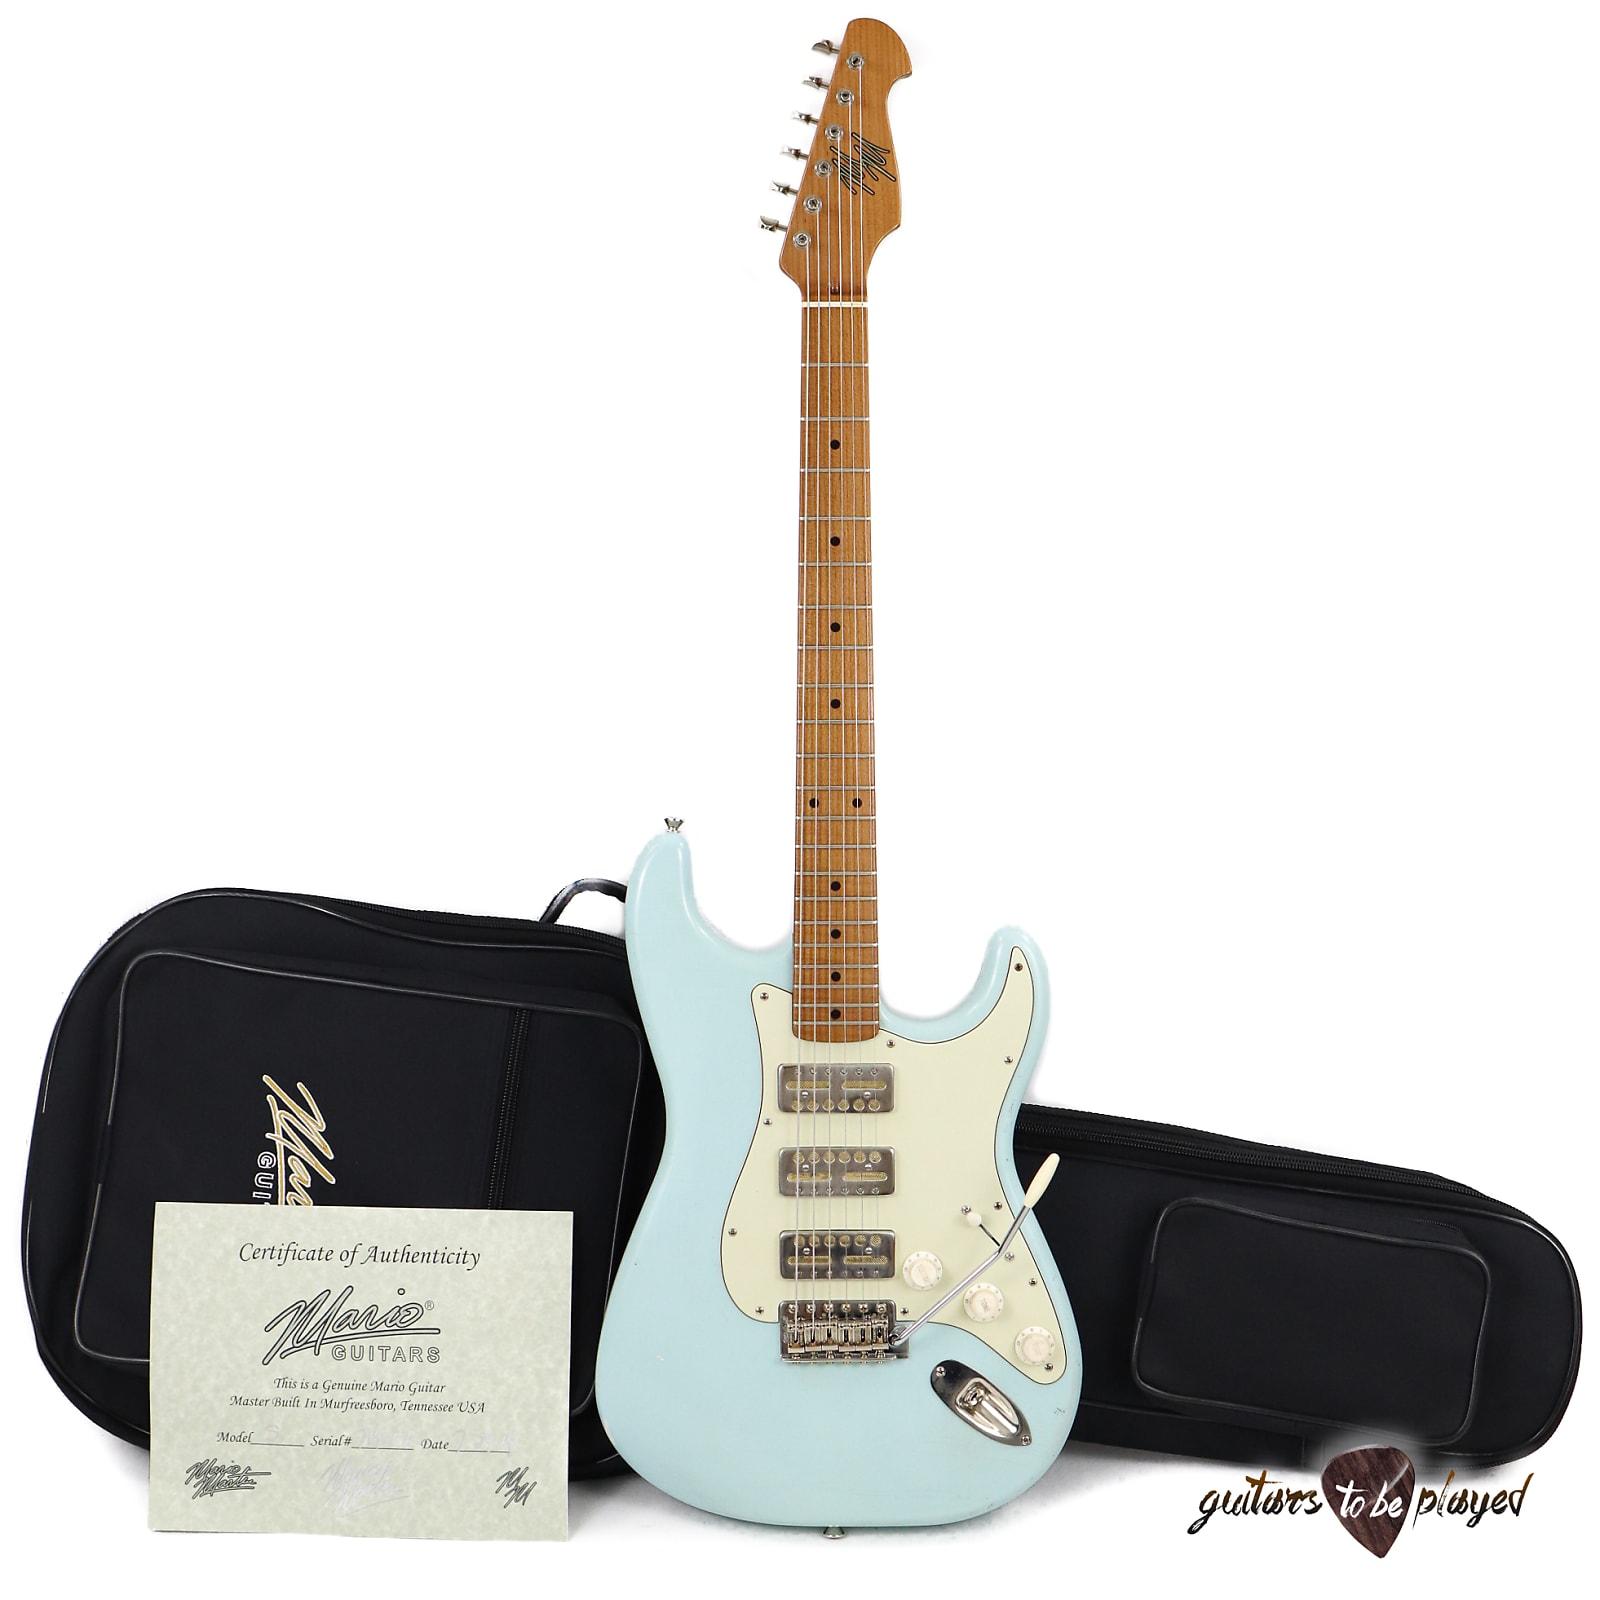 Mario Martin Guitars 1pc Swamp Ash S-Style w/ Lollar GoldFoils, Roasted Maple Neck - Sonic Blue